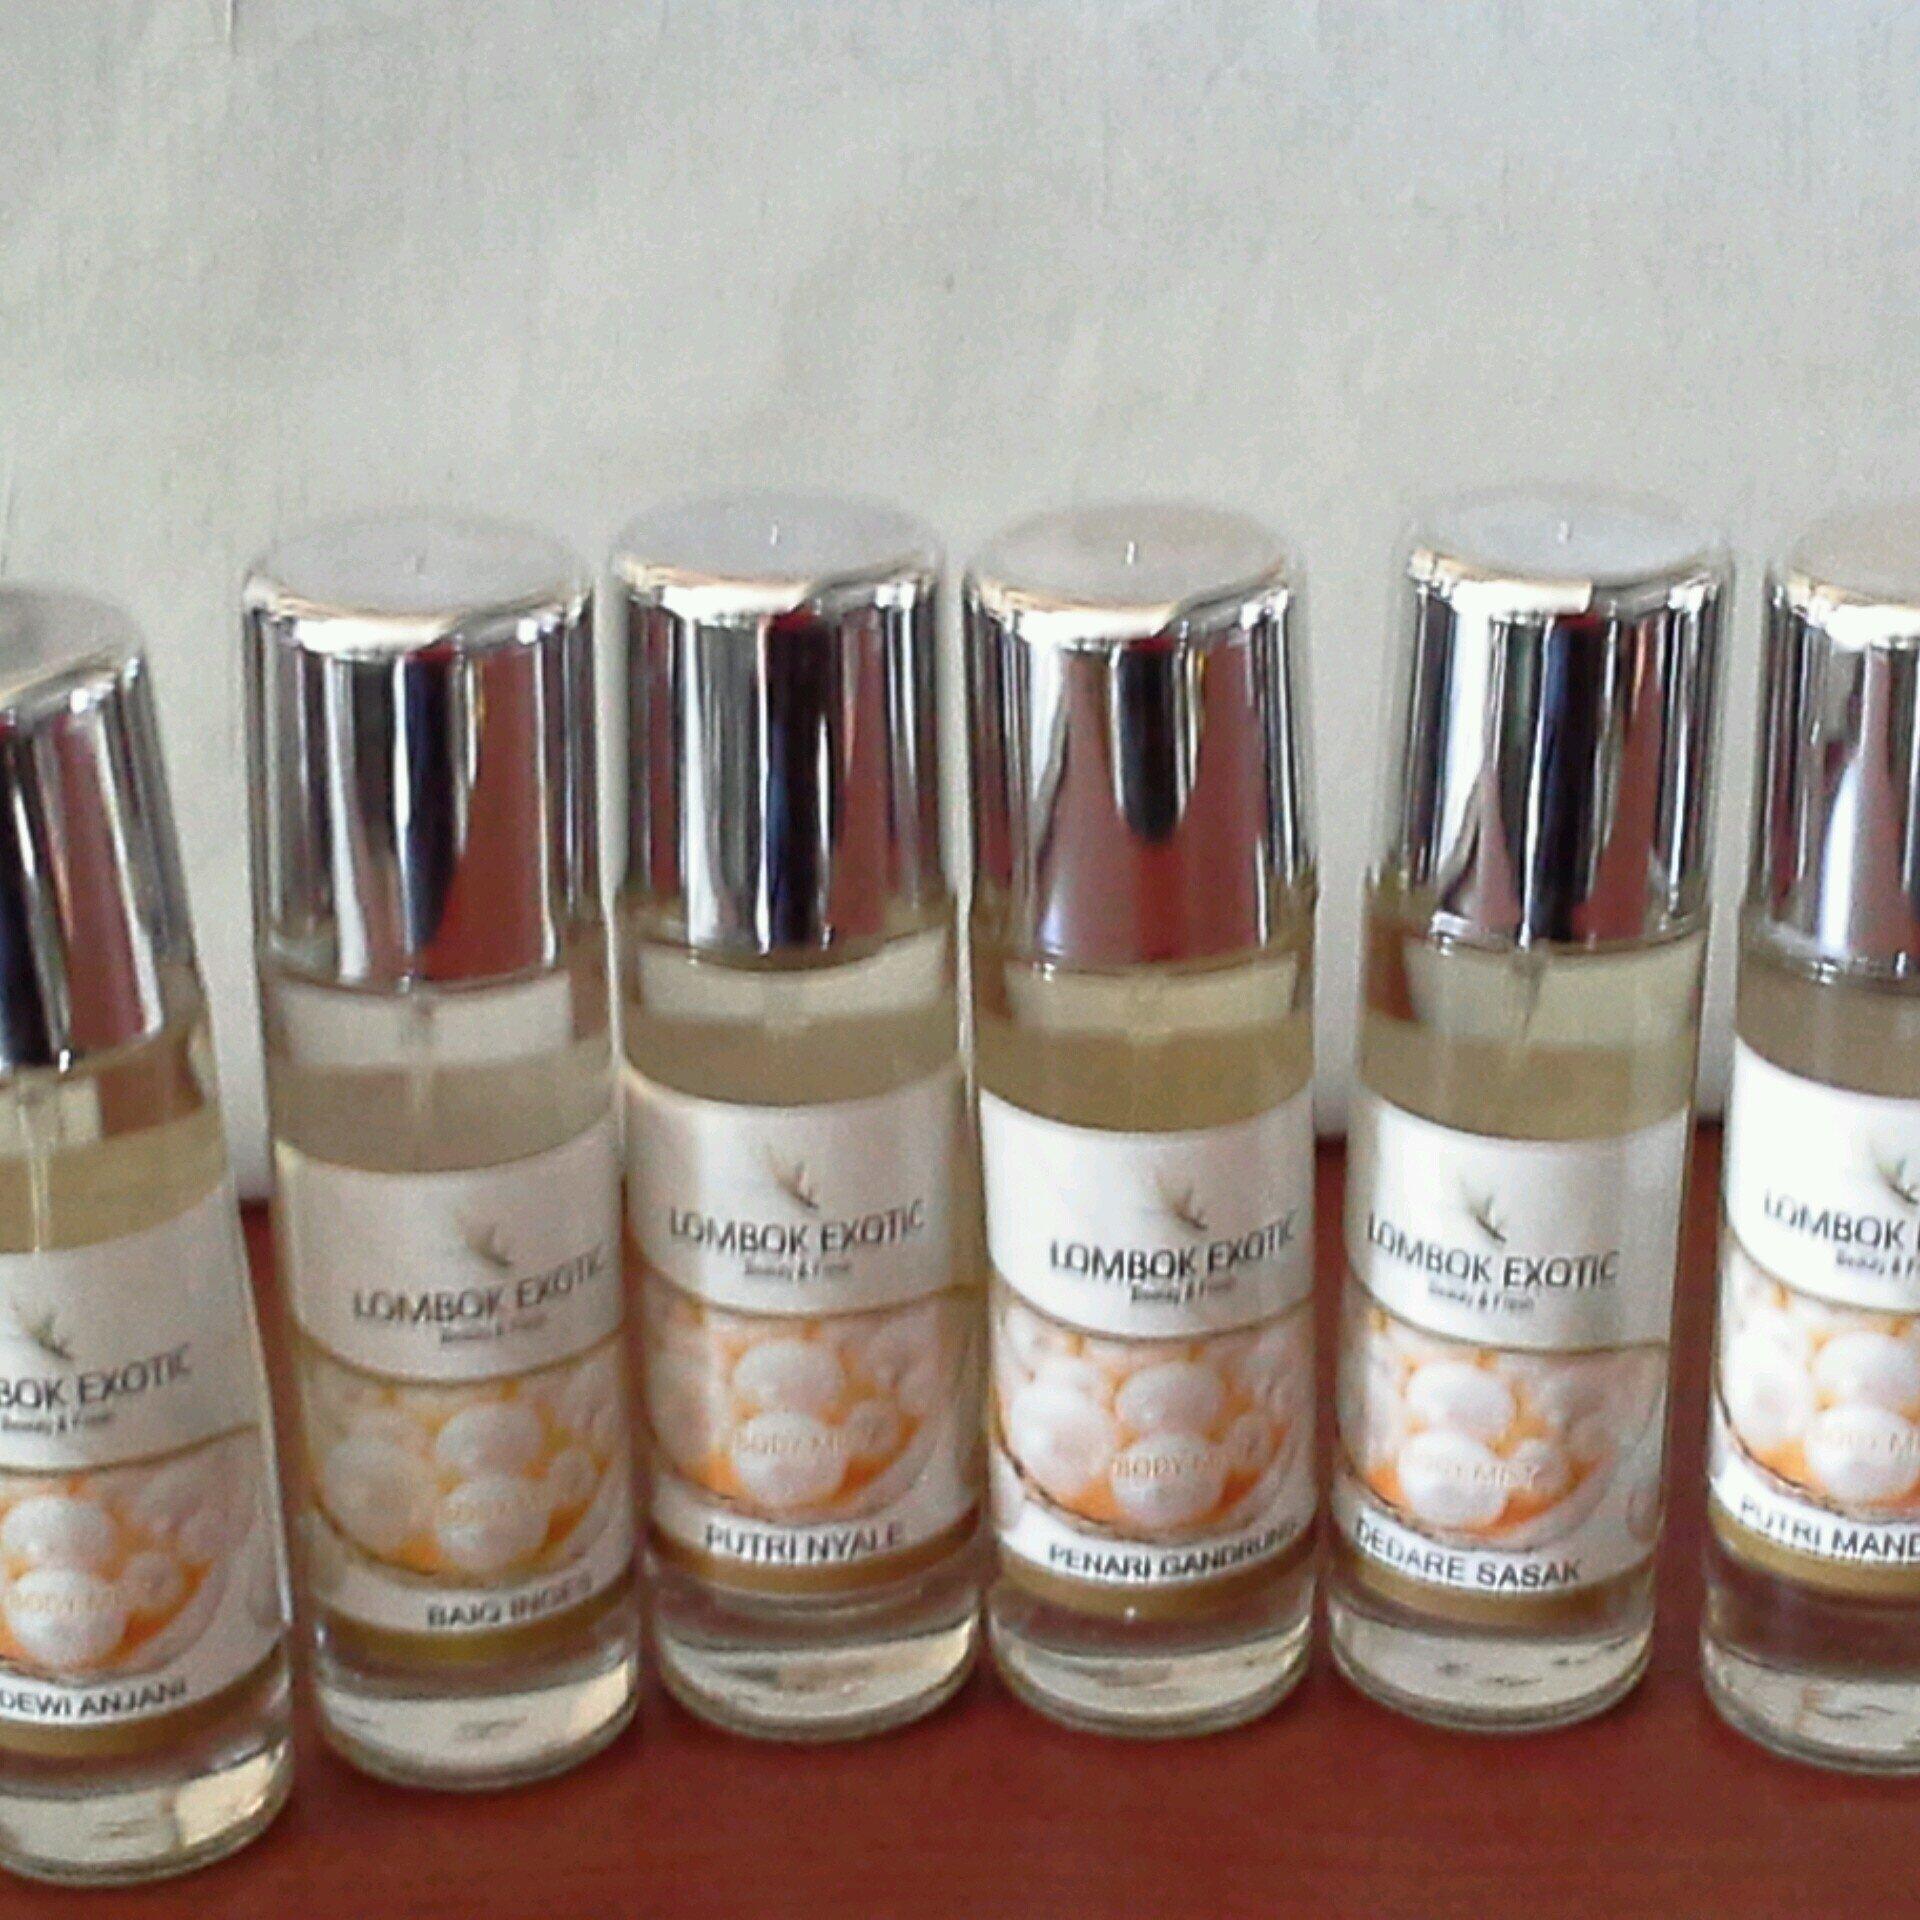 Lombok Exotic Parfum On Twitter Yg Harumnya Awet Dgn Harga Putri